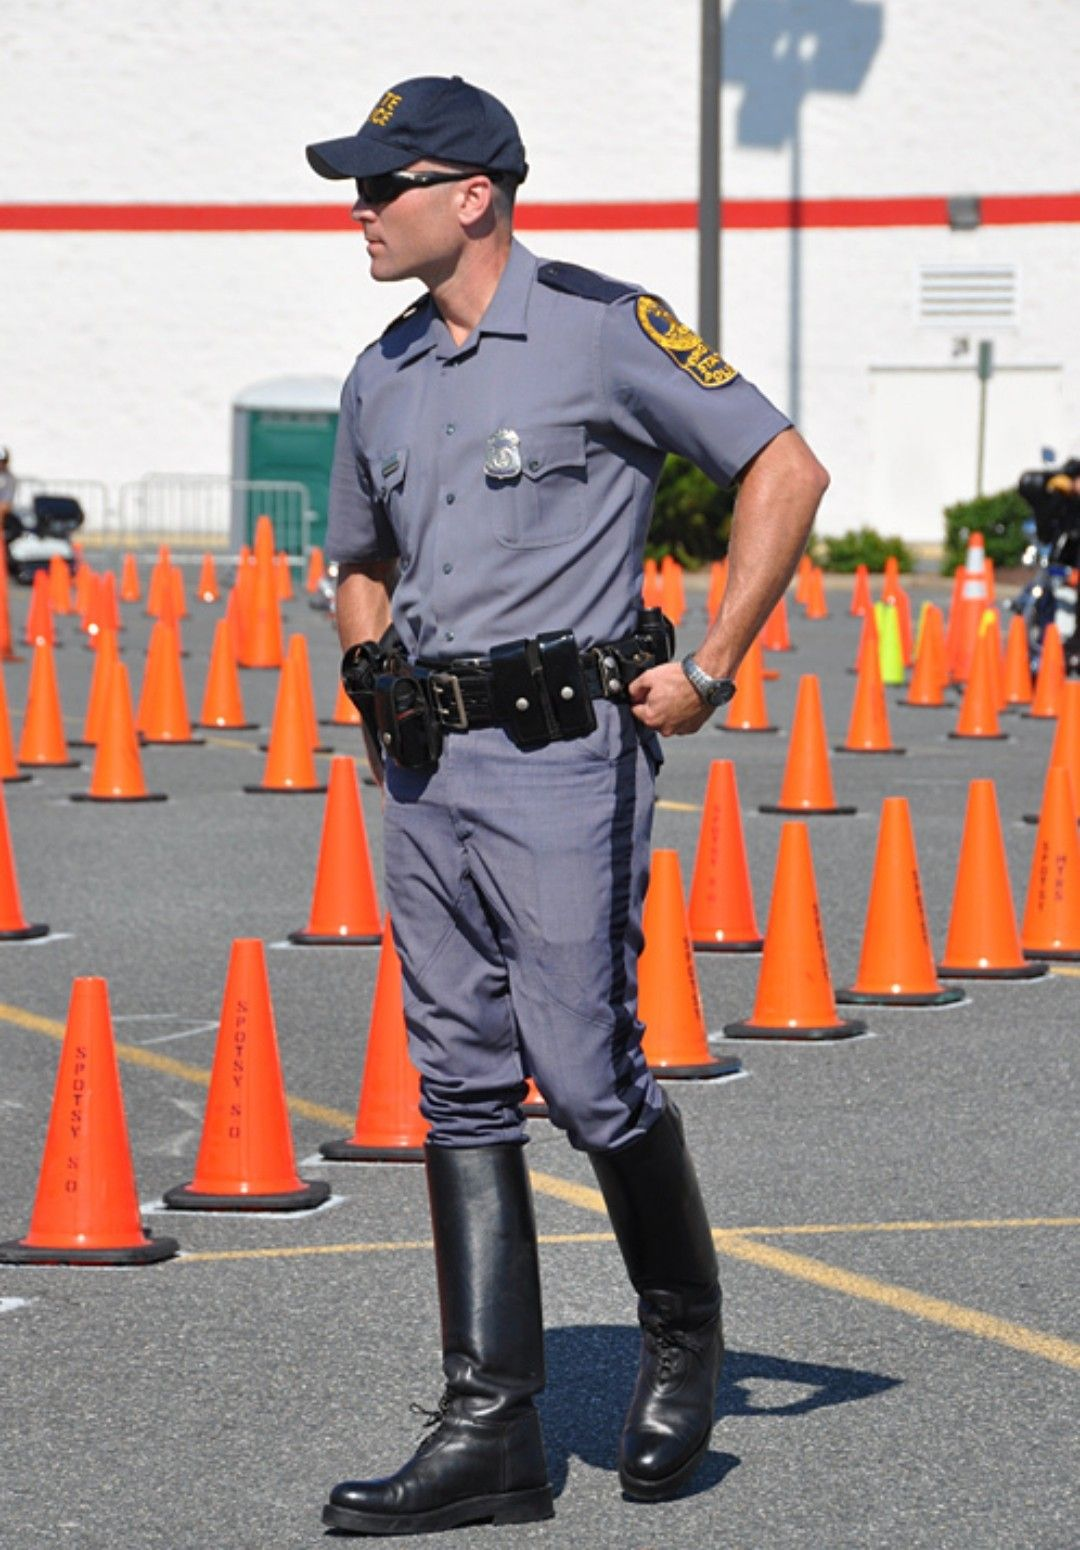 Pin by Chris Wittmann on Cops | State police, Men in uniform, Good looking men